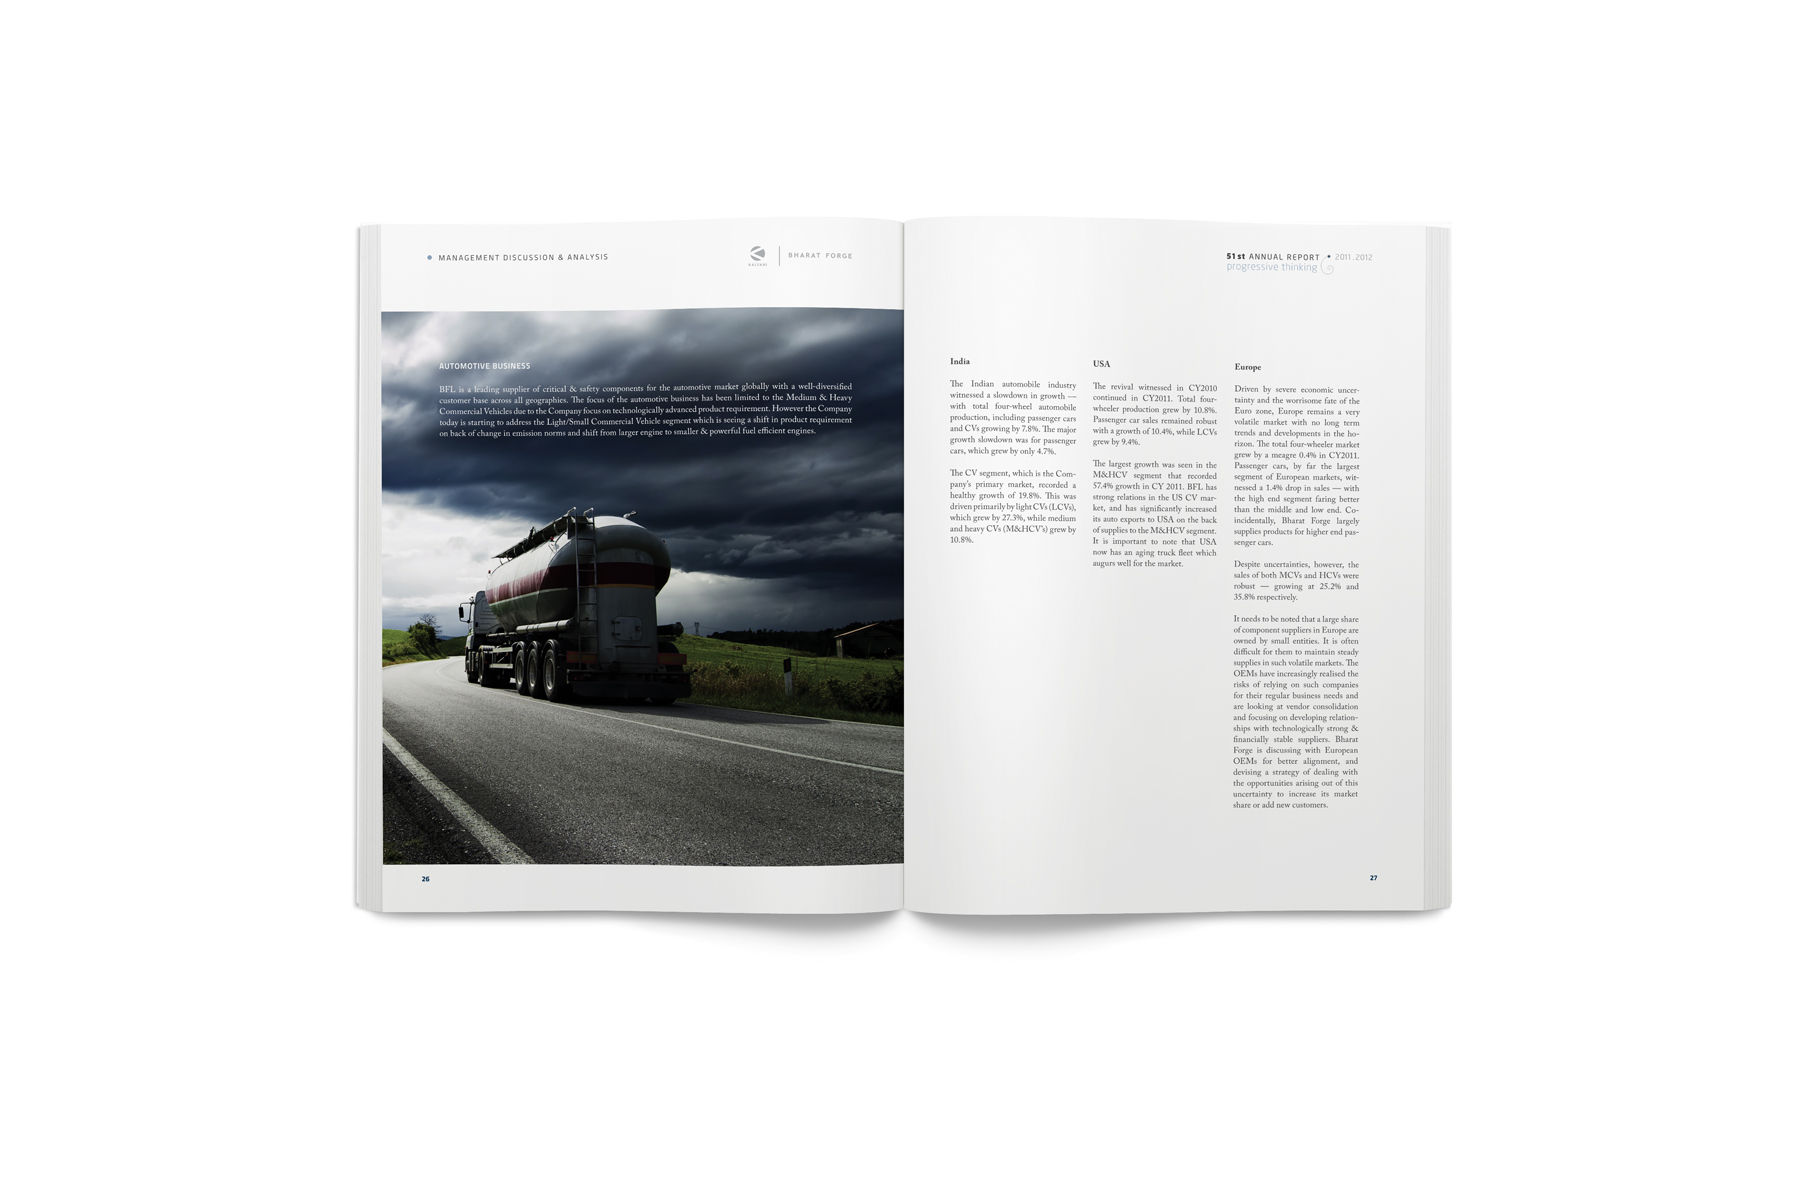 Magazine-0408-2013-03-26-055754-+0000.jpg